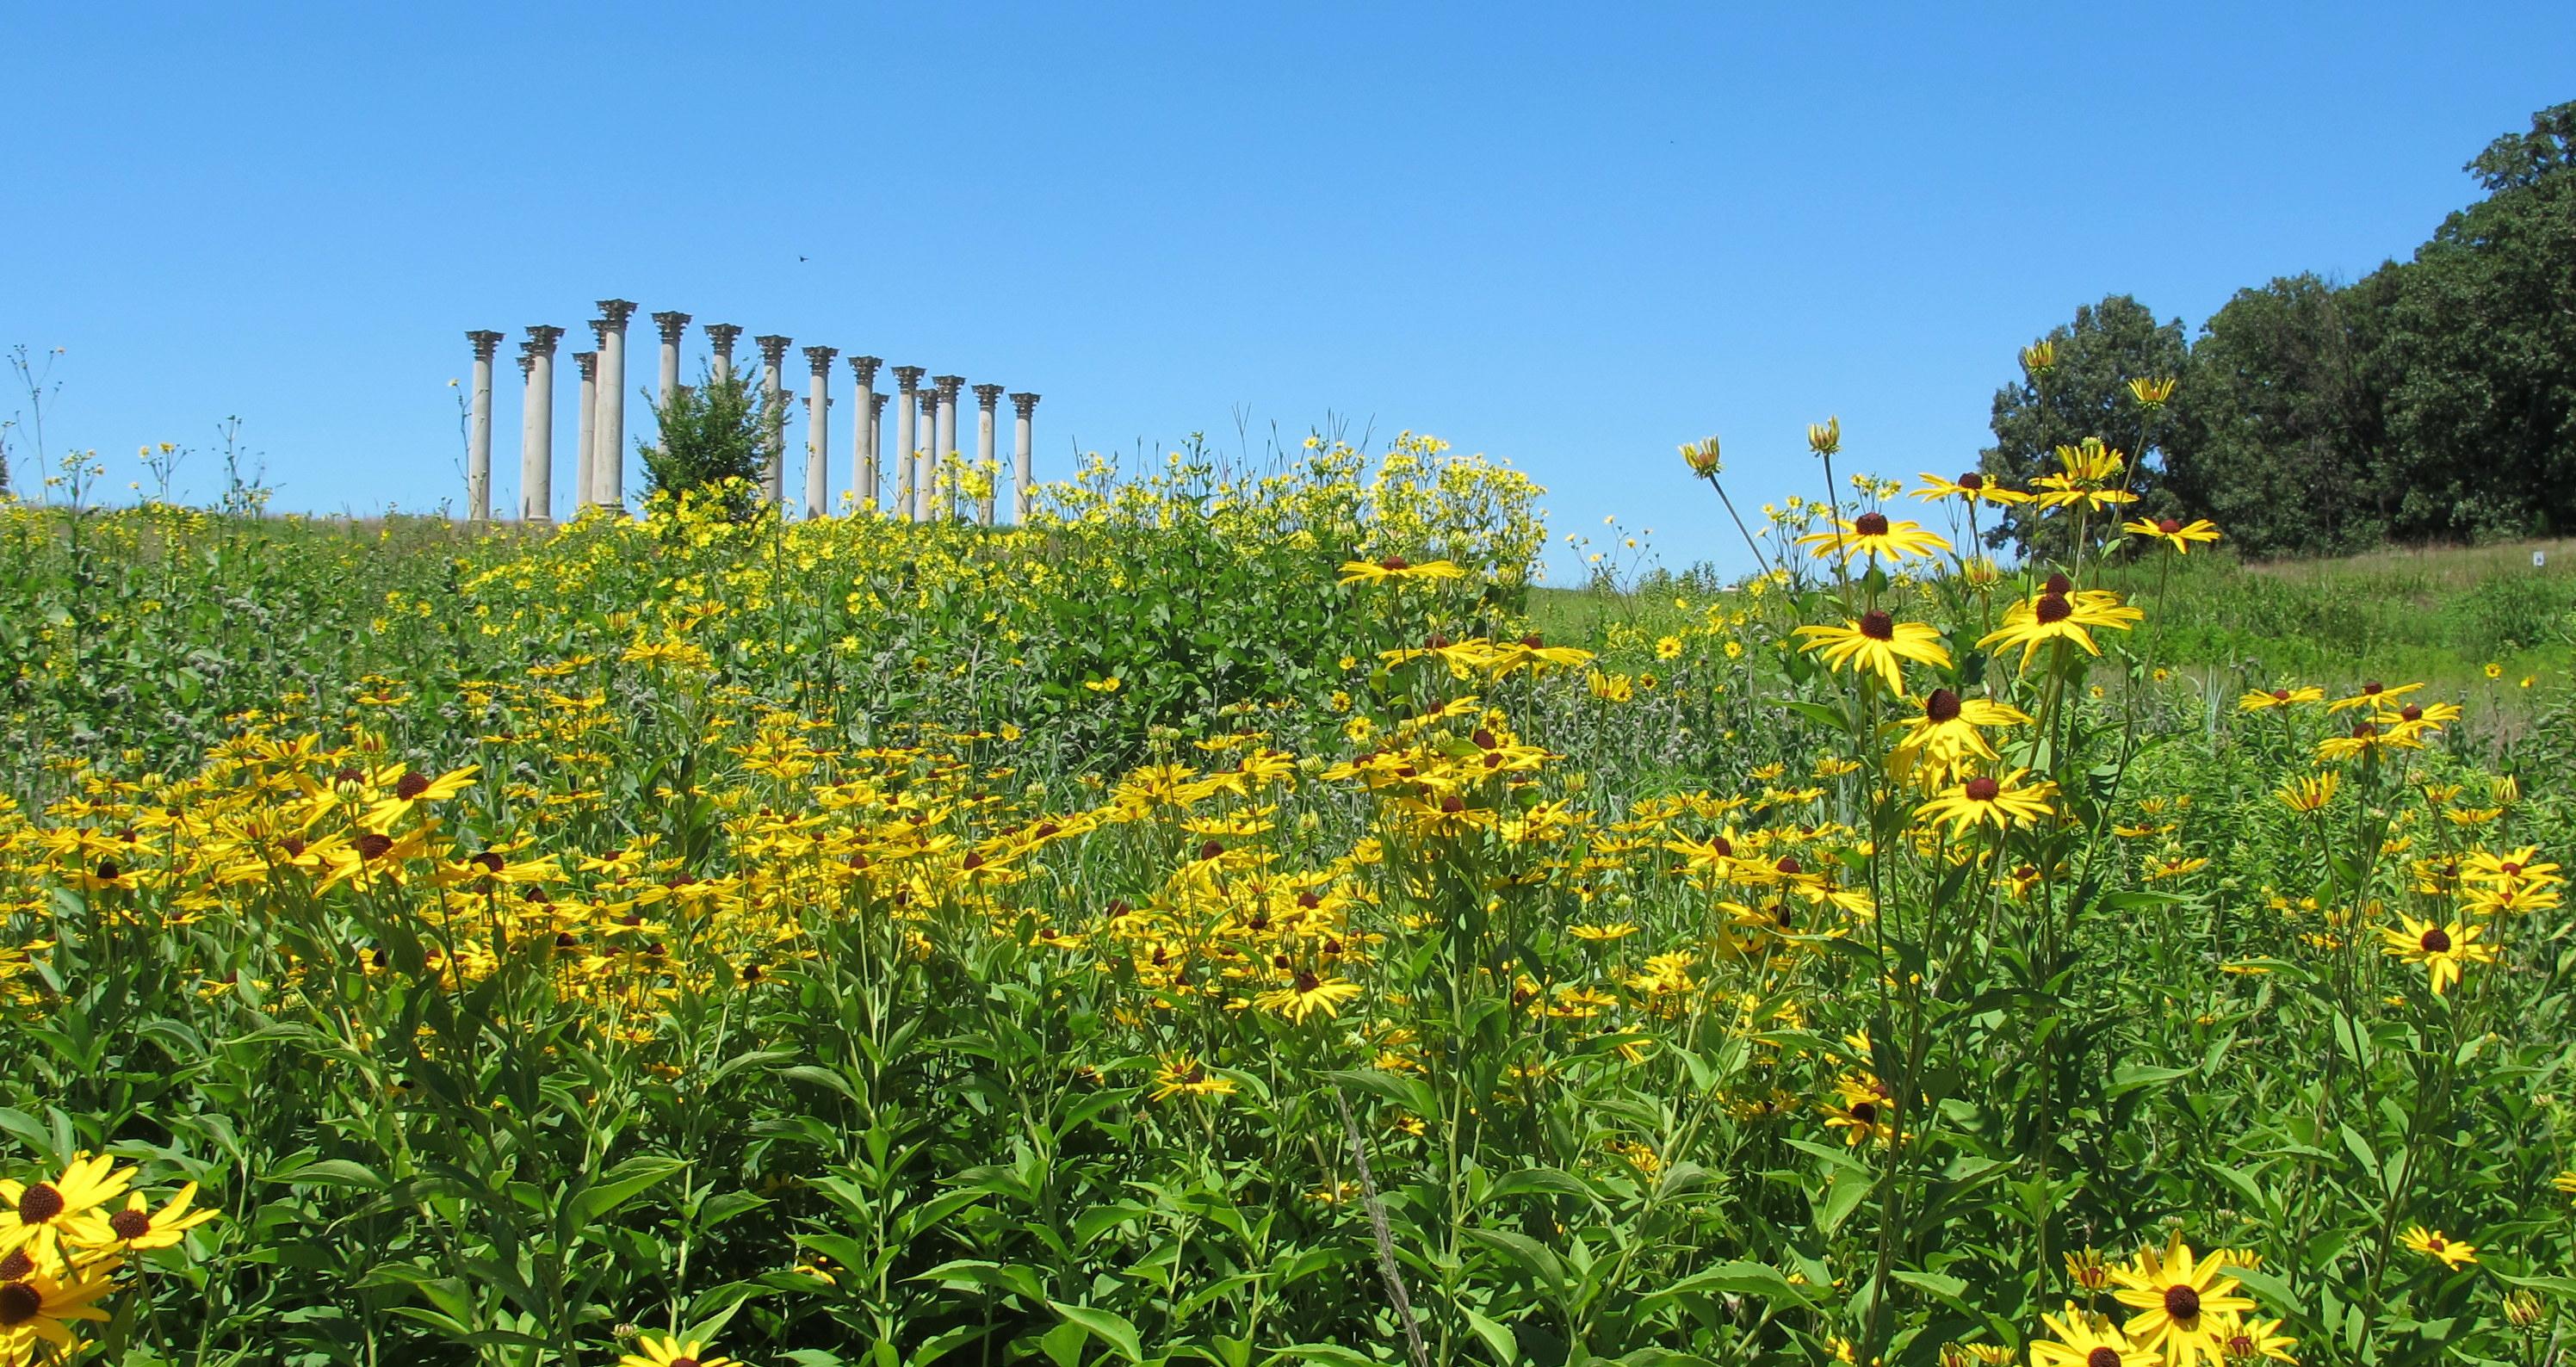 National_Arboretum_in_July_(23490966971)